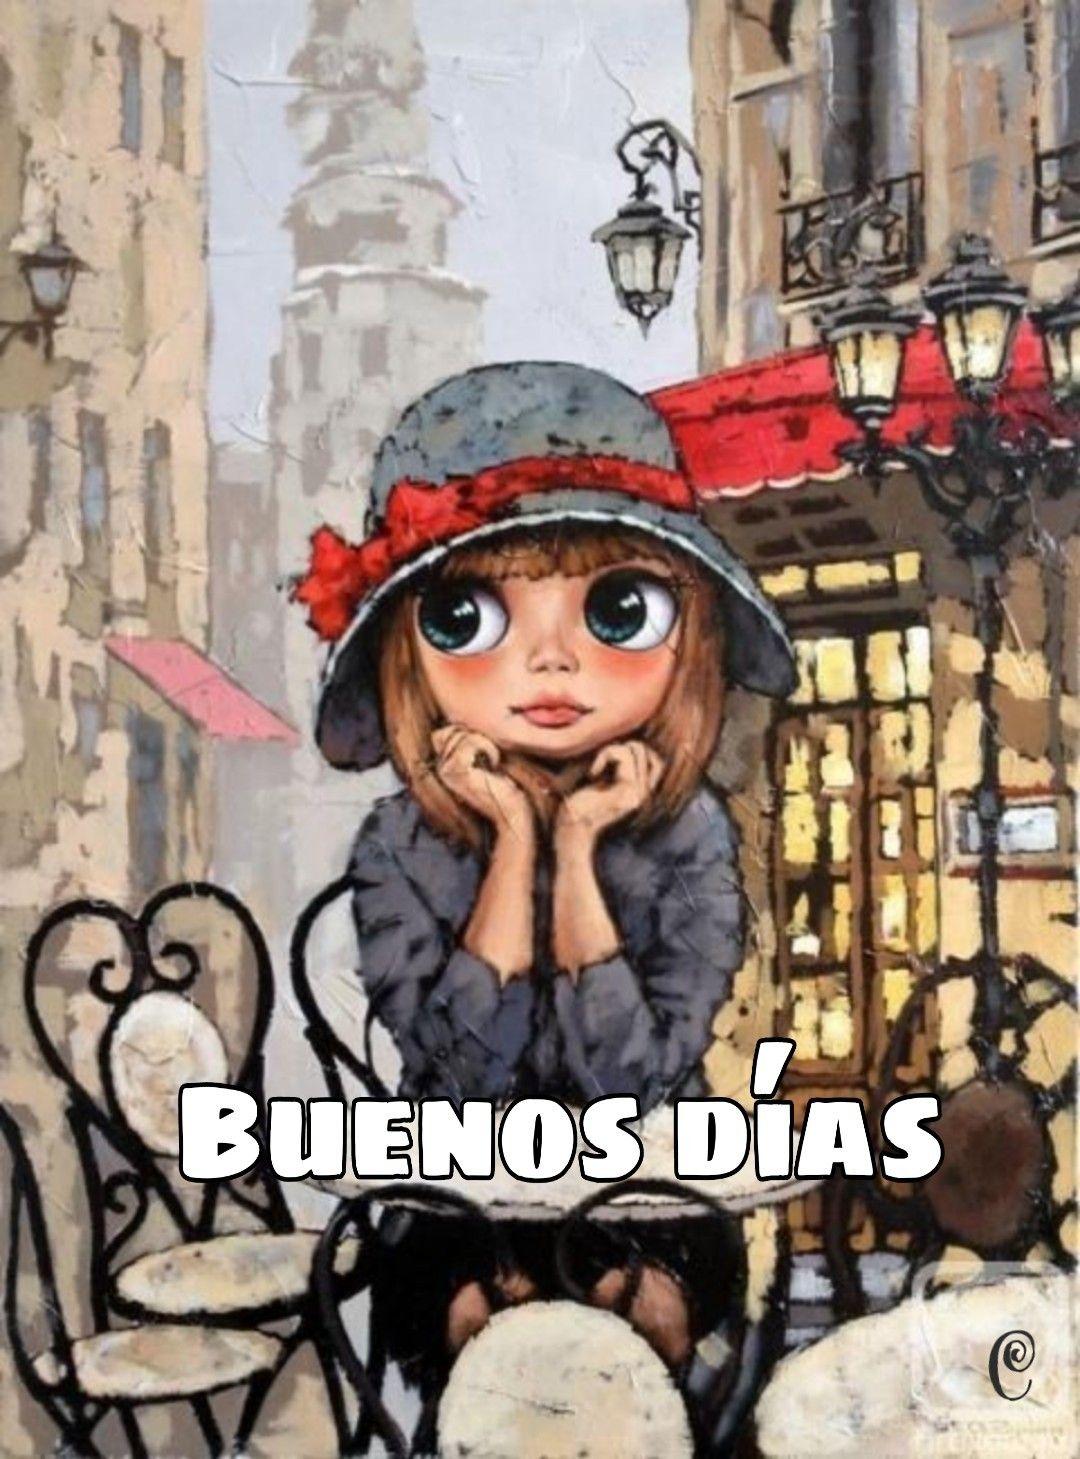 Buenas Dias Tarde Noche Saludos D Buenos Dias Chistes De Buenos Dias Memes De Buenos Dias